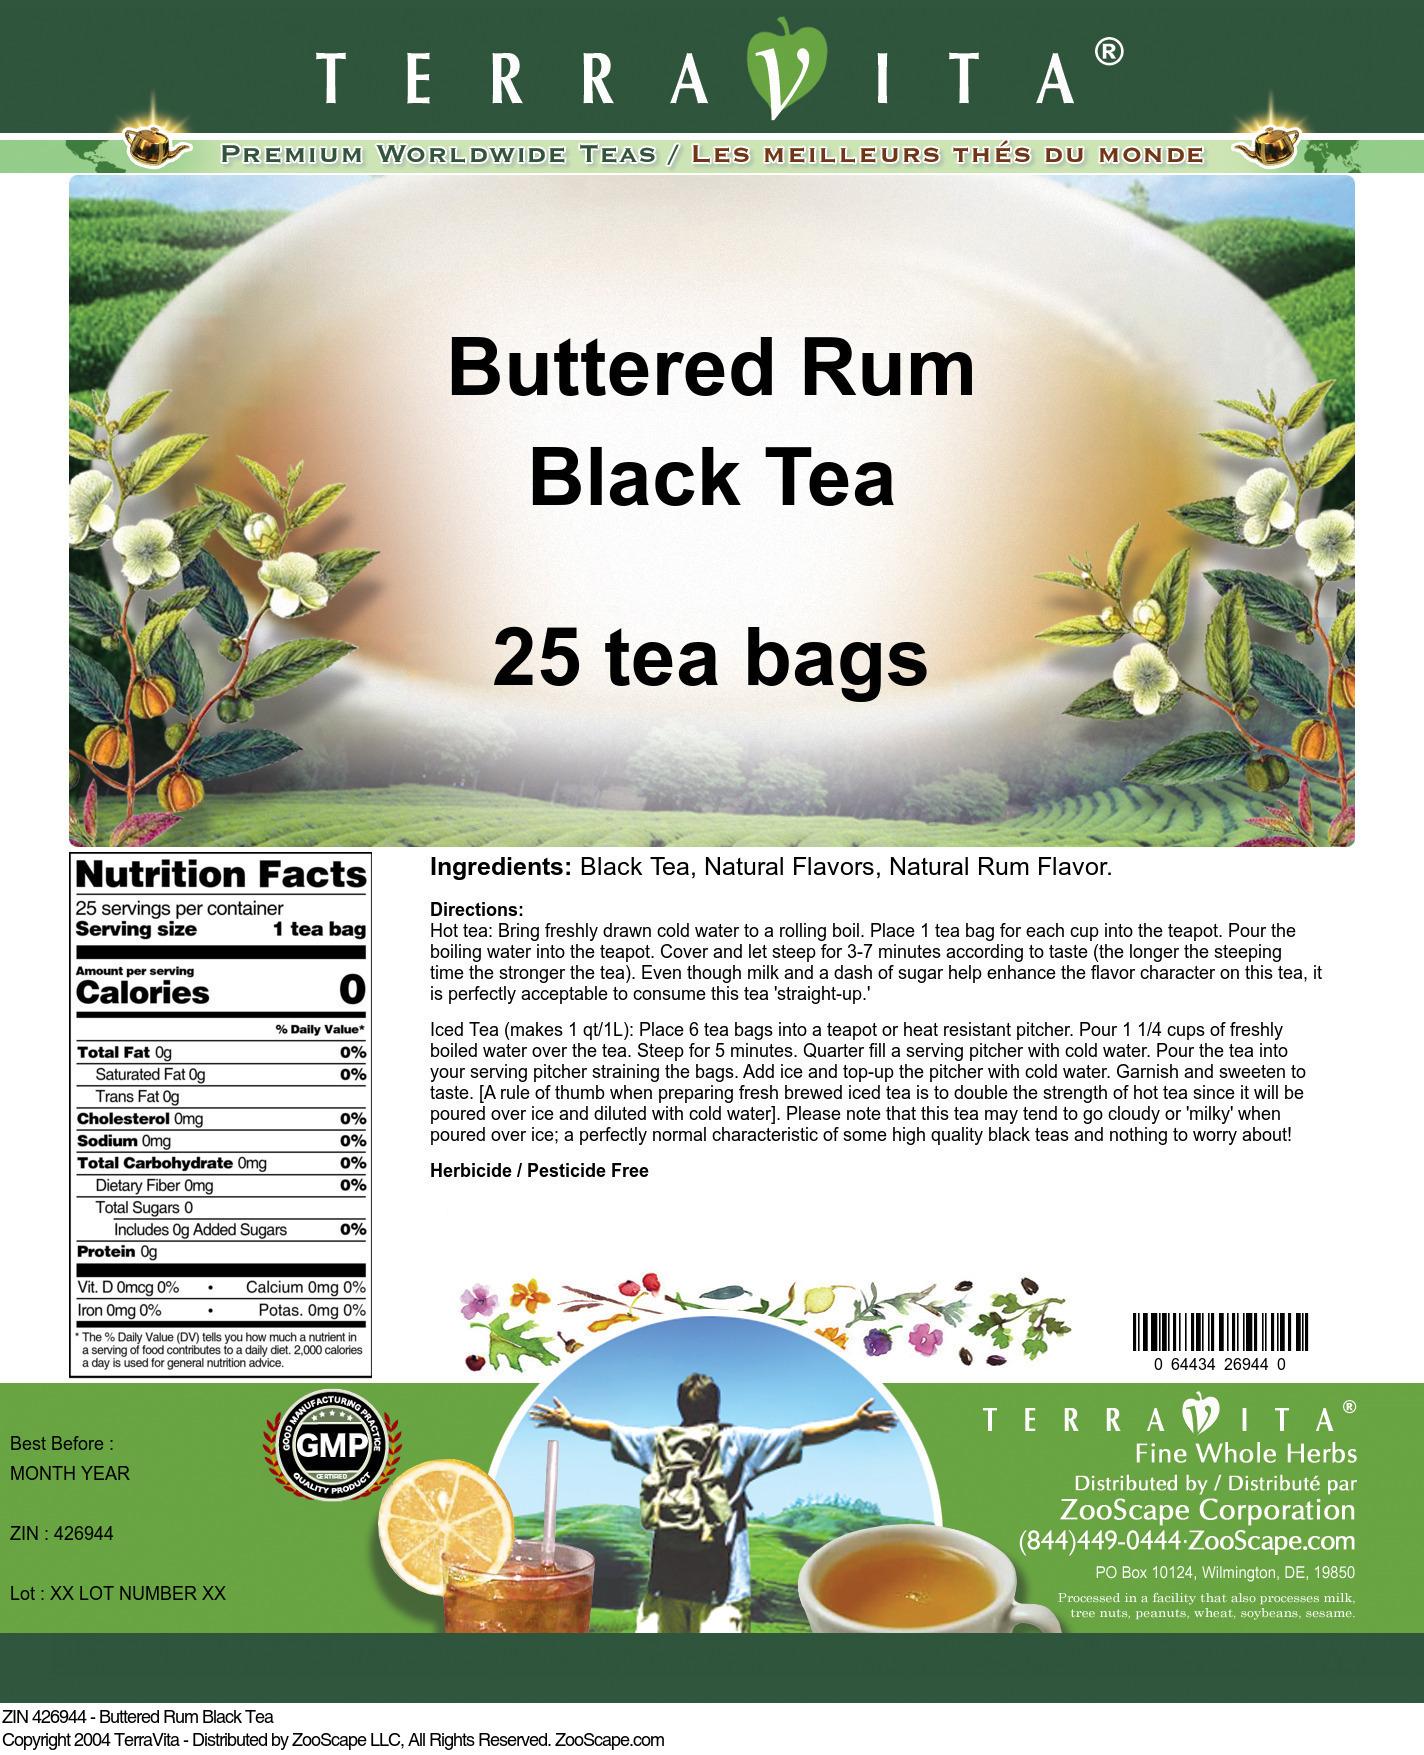 Butter Rum Black Tea